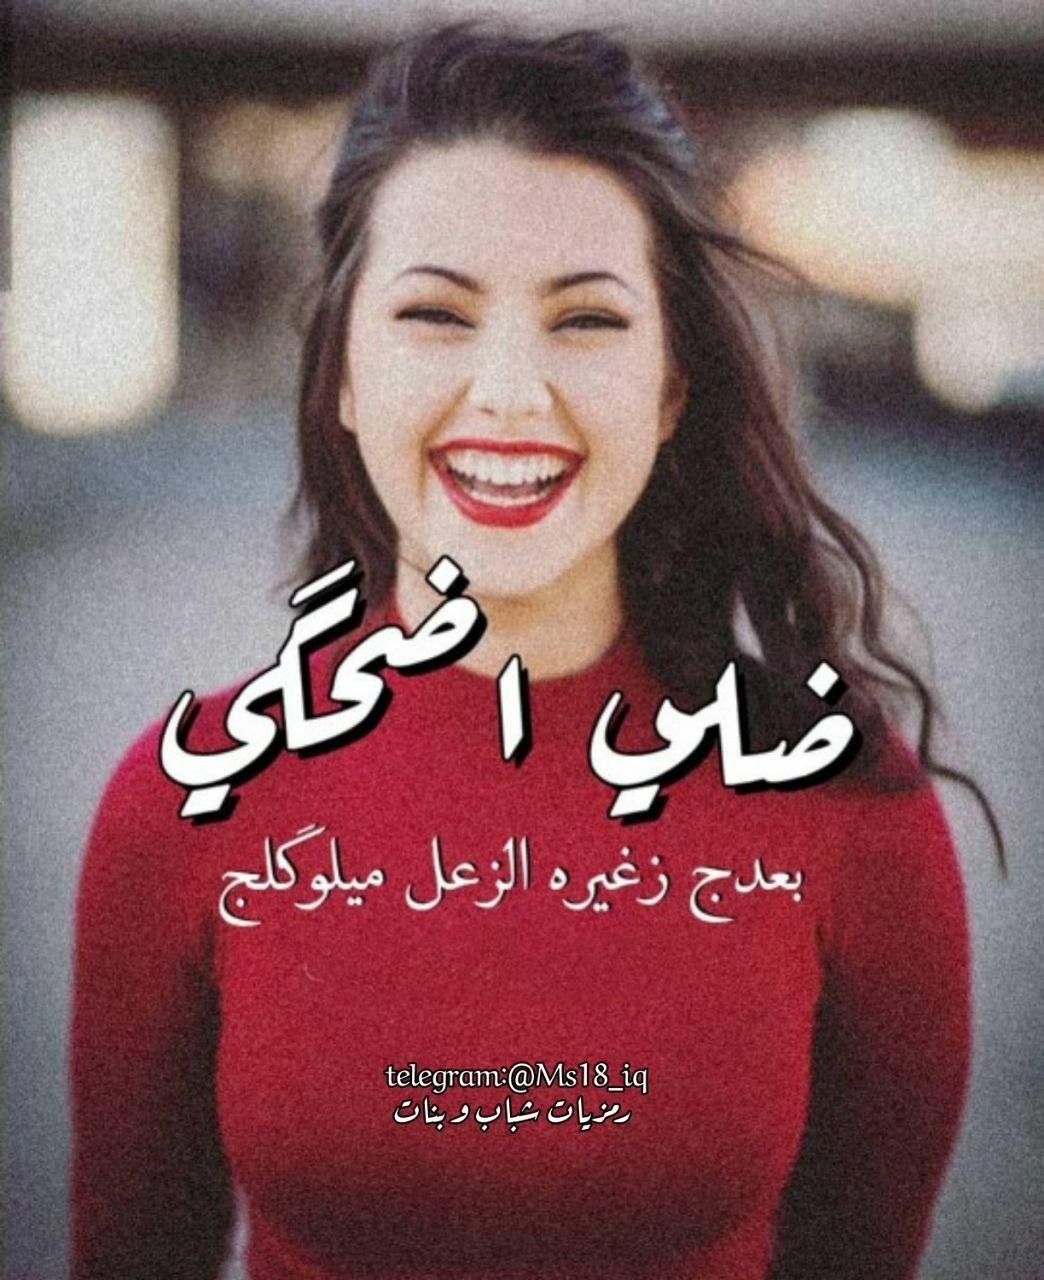 شعر شعبي عراقي عن الحب Cover Photo Quotes Love Husband Quotes Husband Quotes